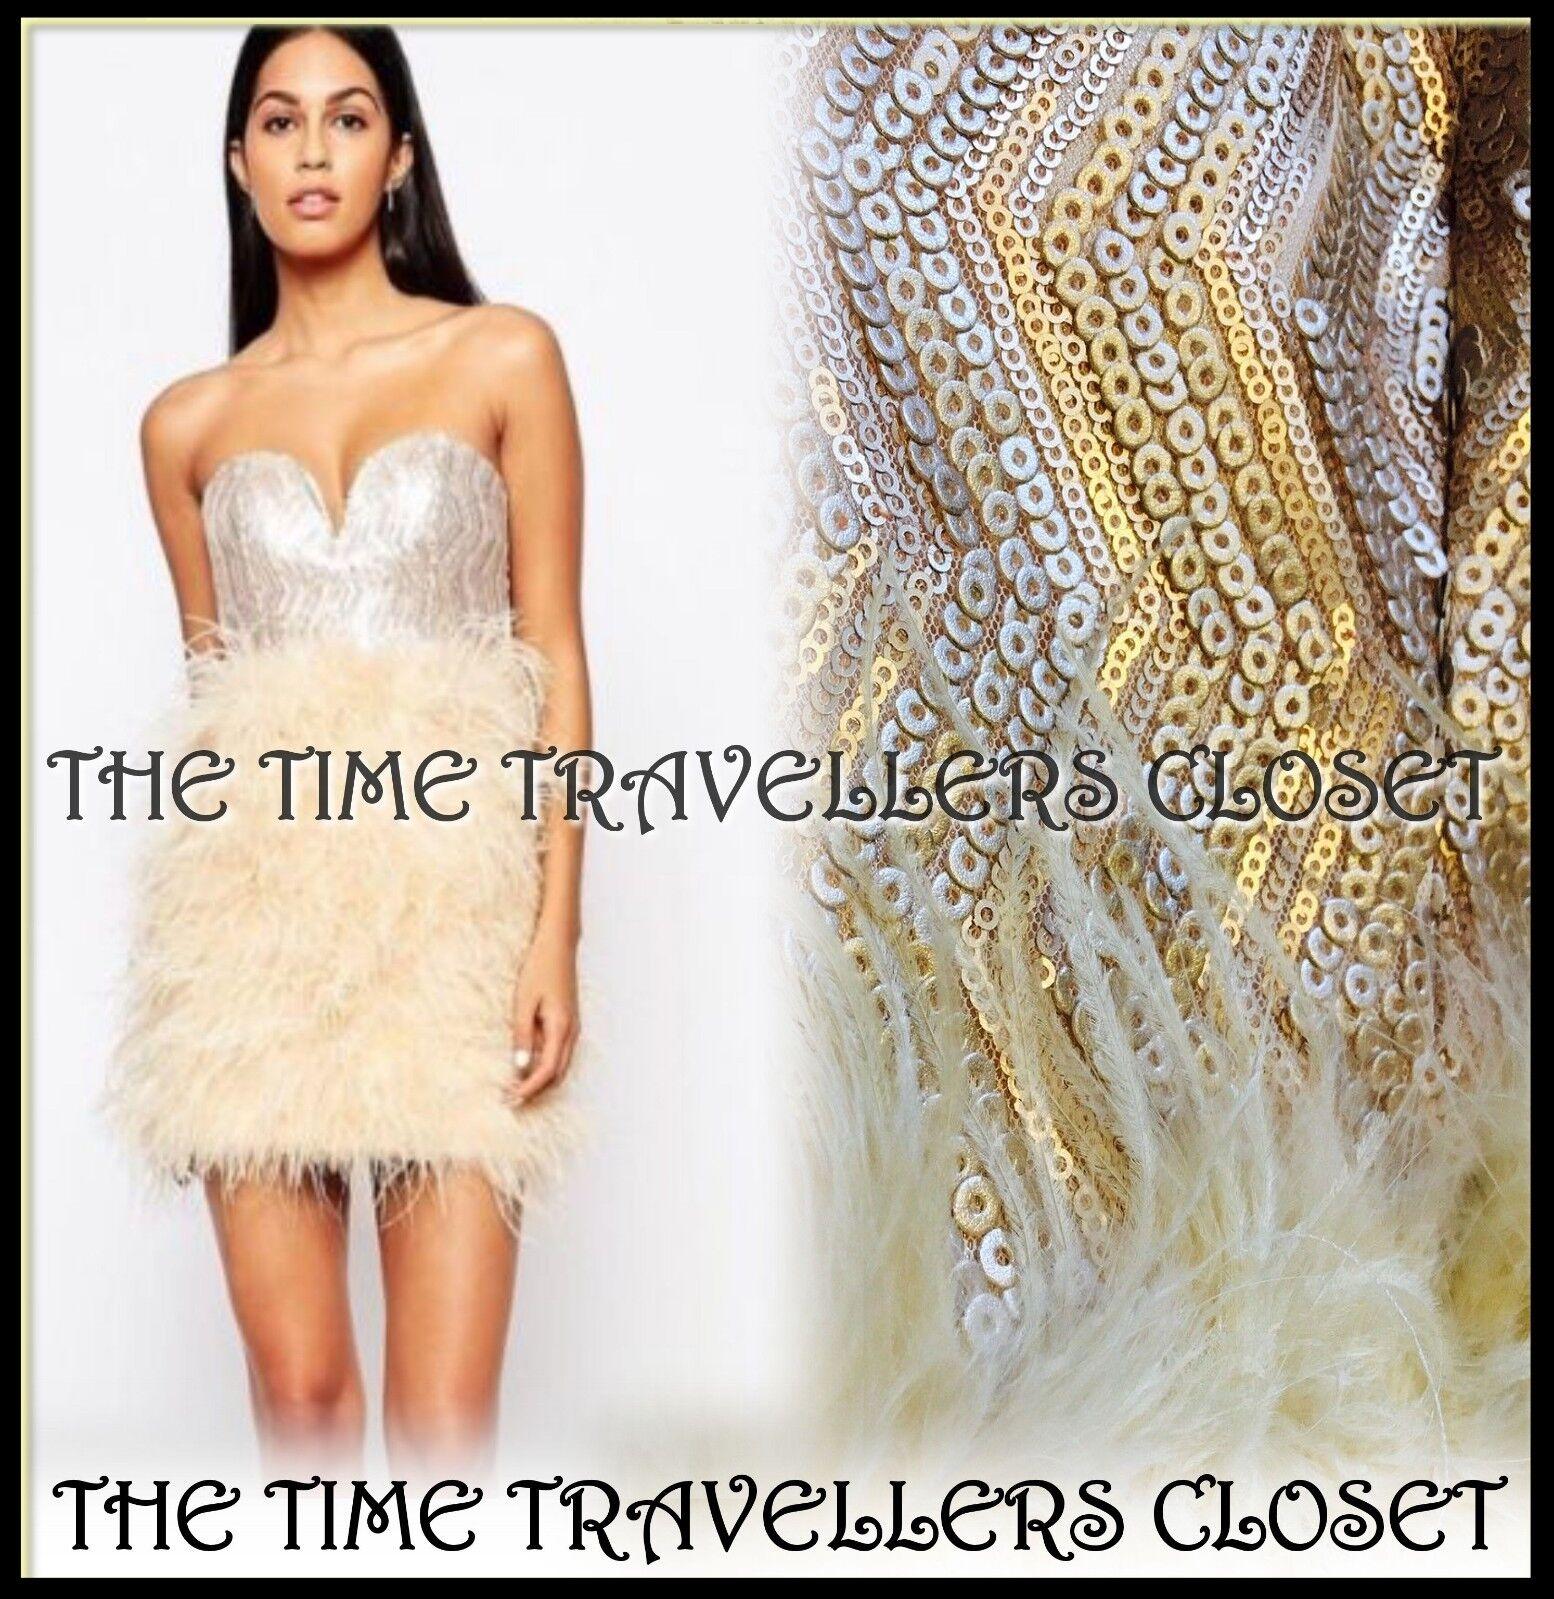 BNWT RARE OPULENCE Topshop Nude Ostrich Feather Sequin Corset Mini Dress UK 6